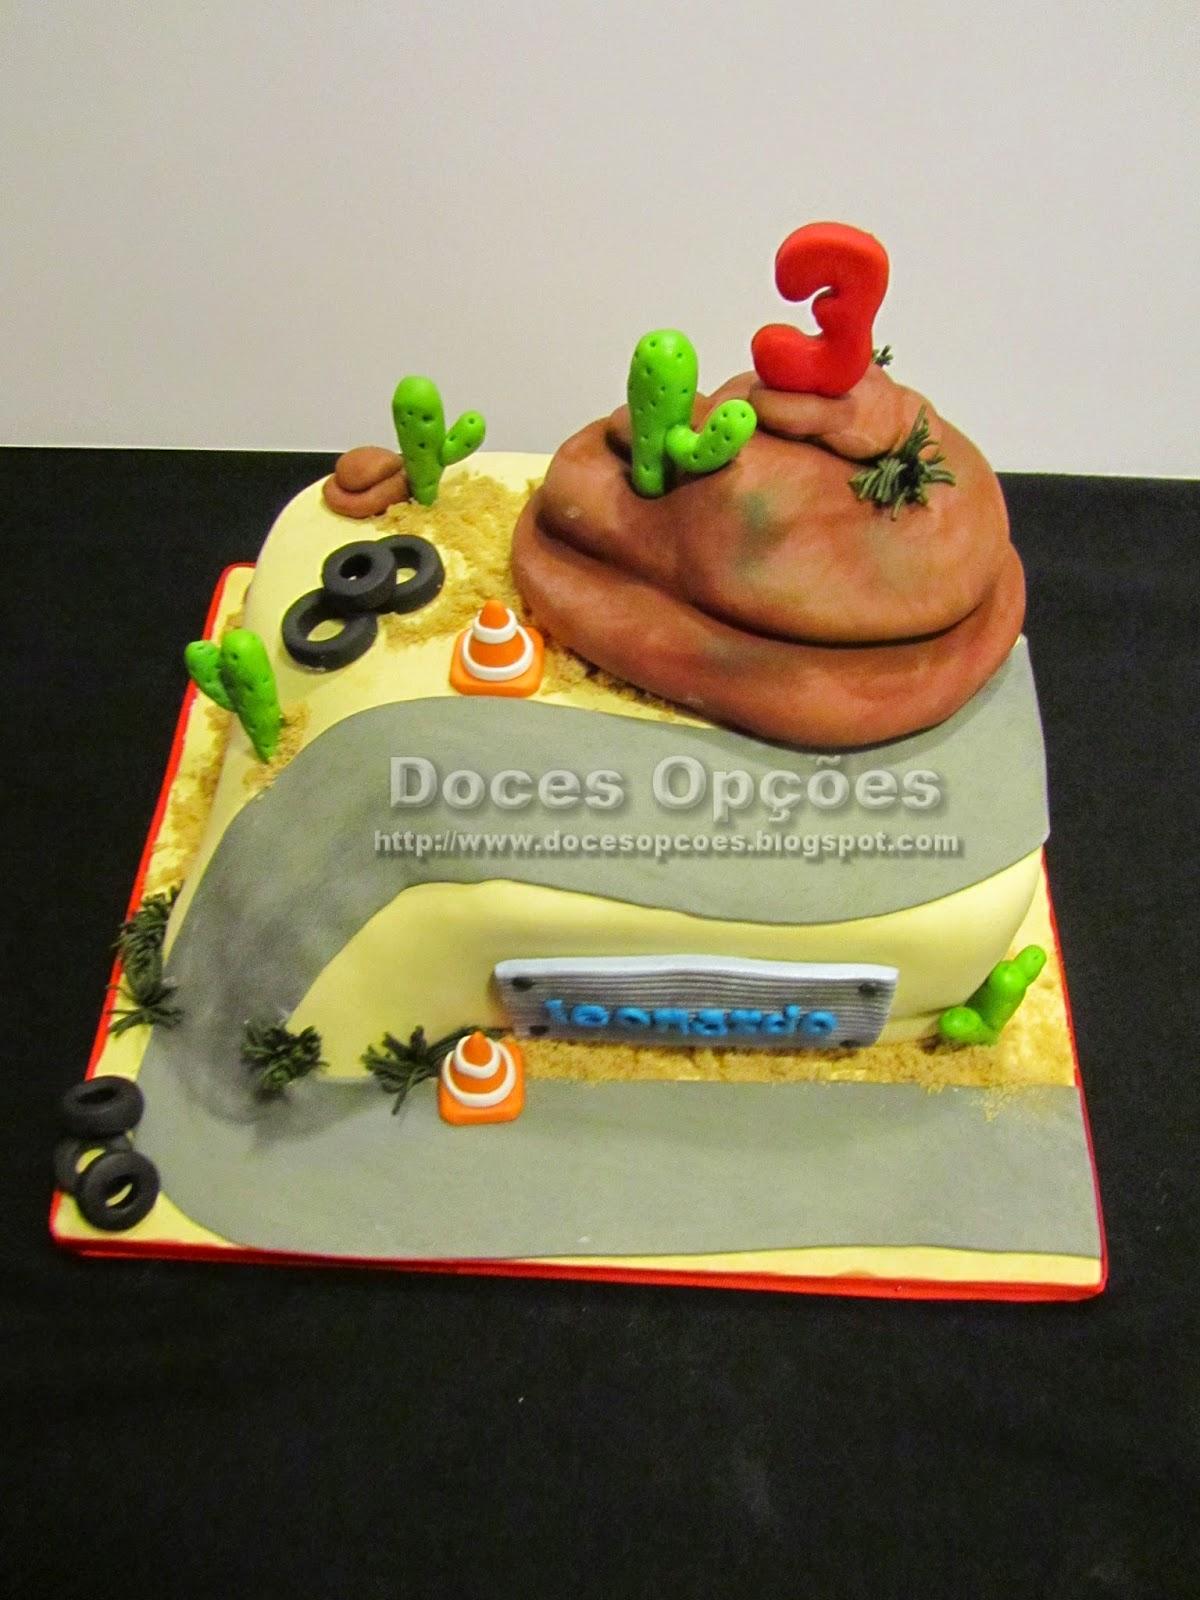 Radiator Spring cake